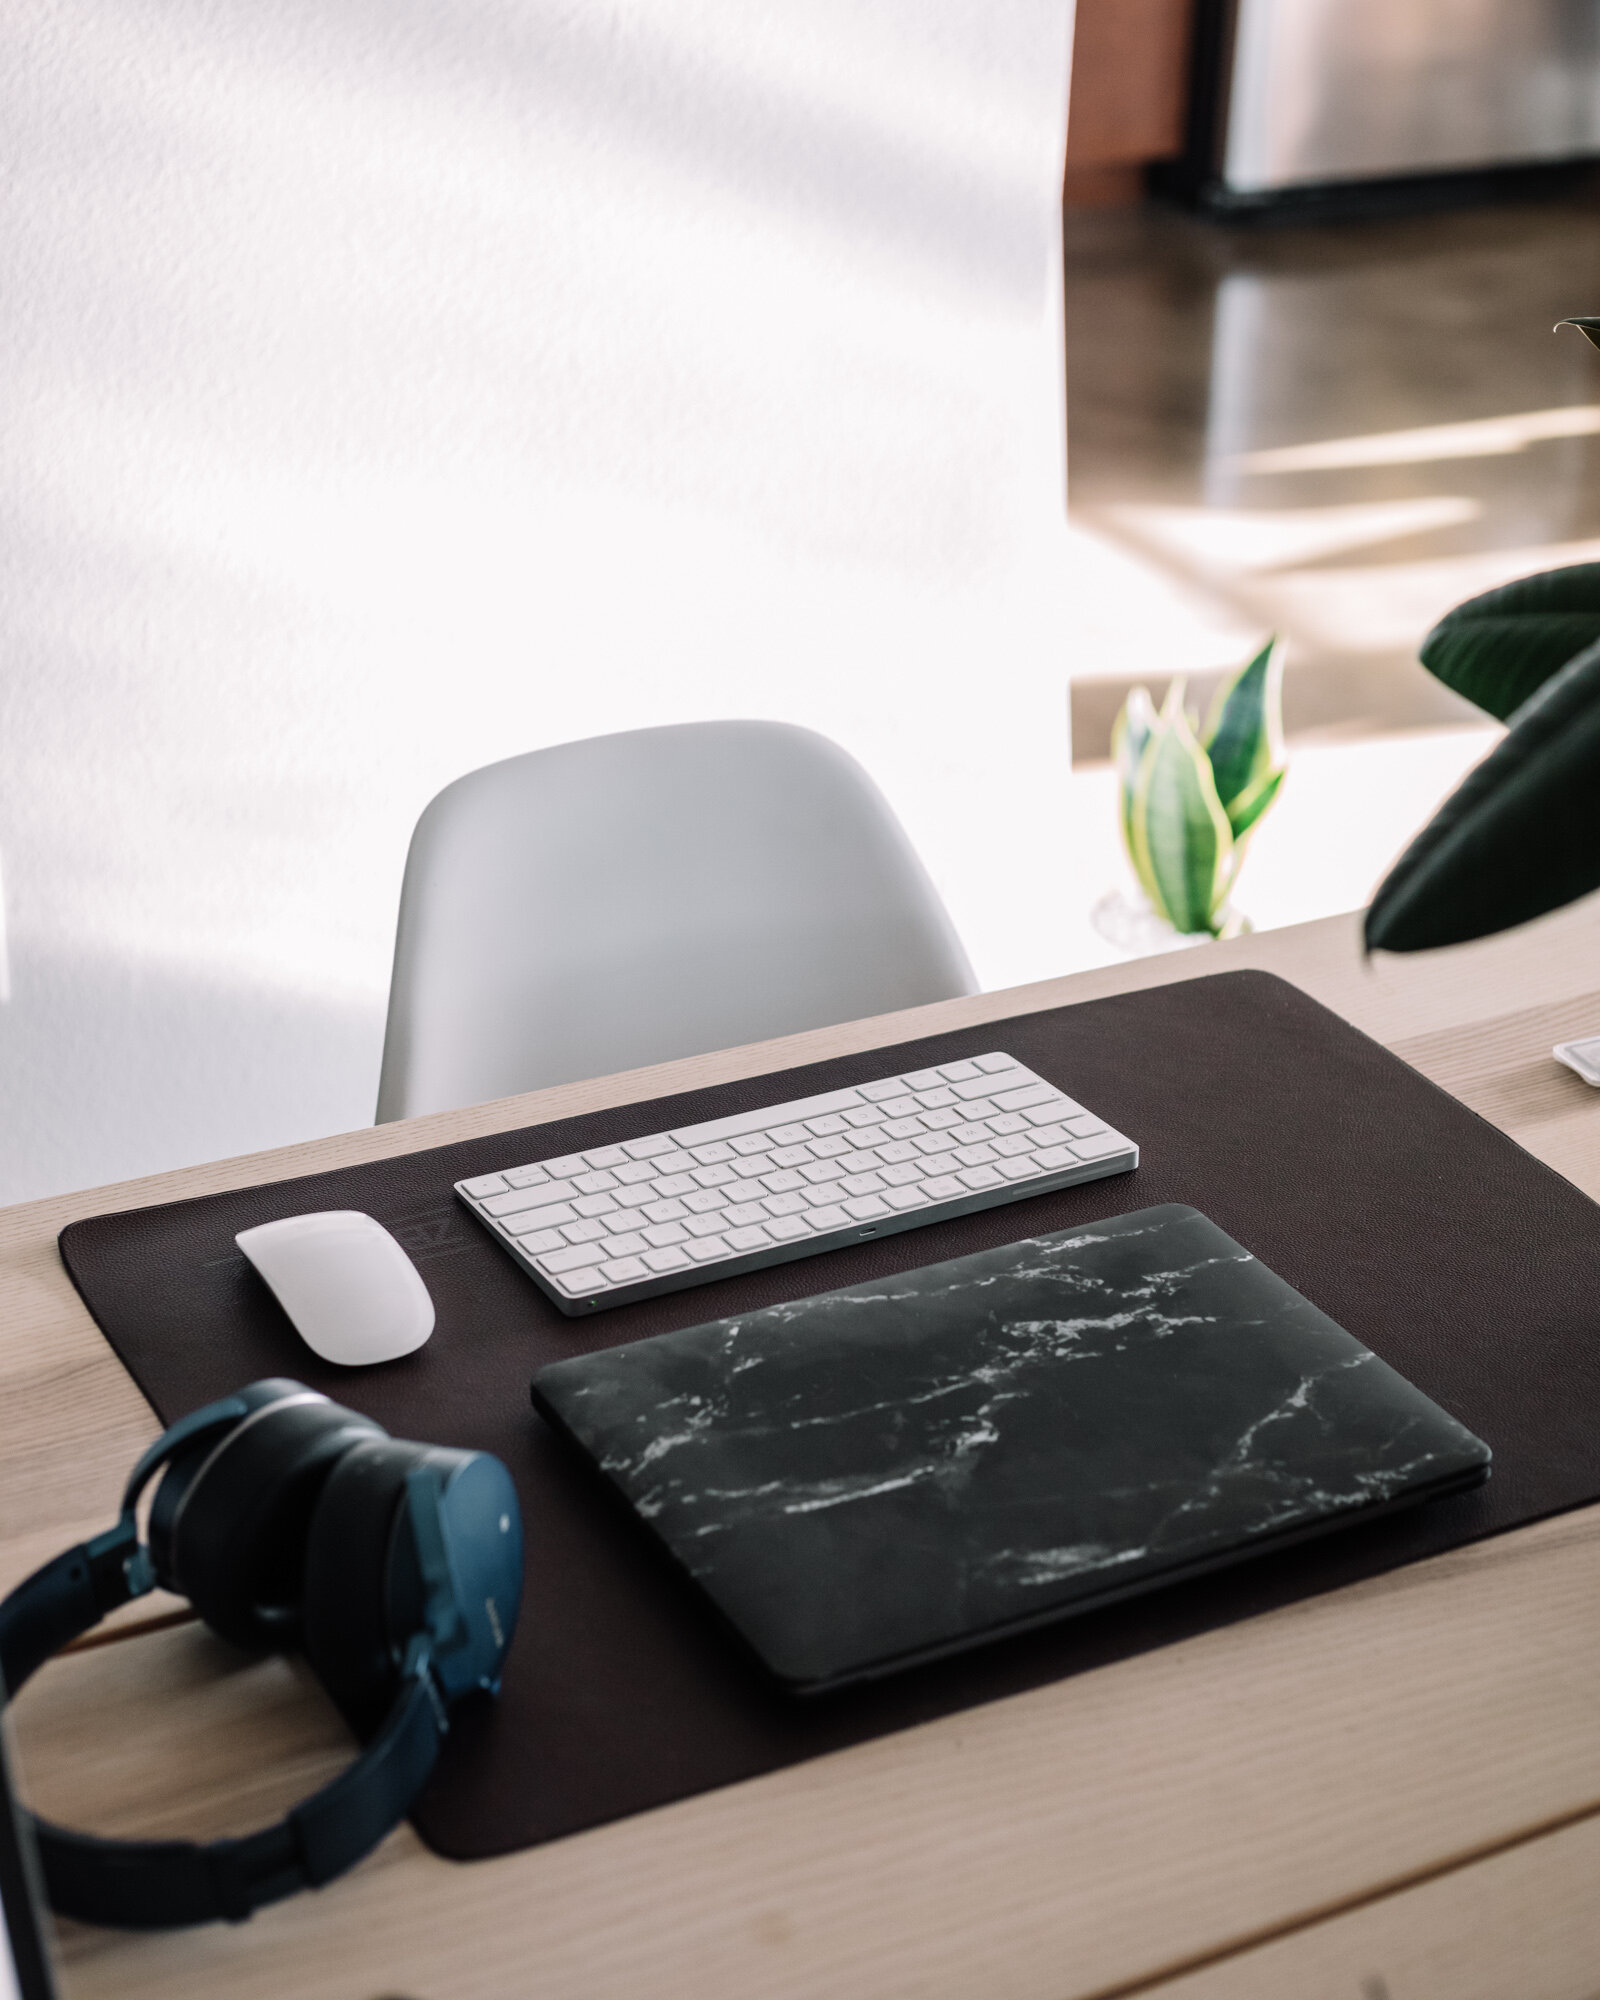 Rachel Off Duty: Home Office Chair, Computer, and Headphones